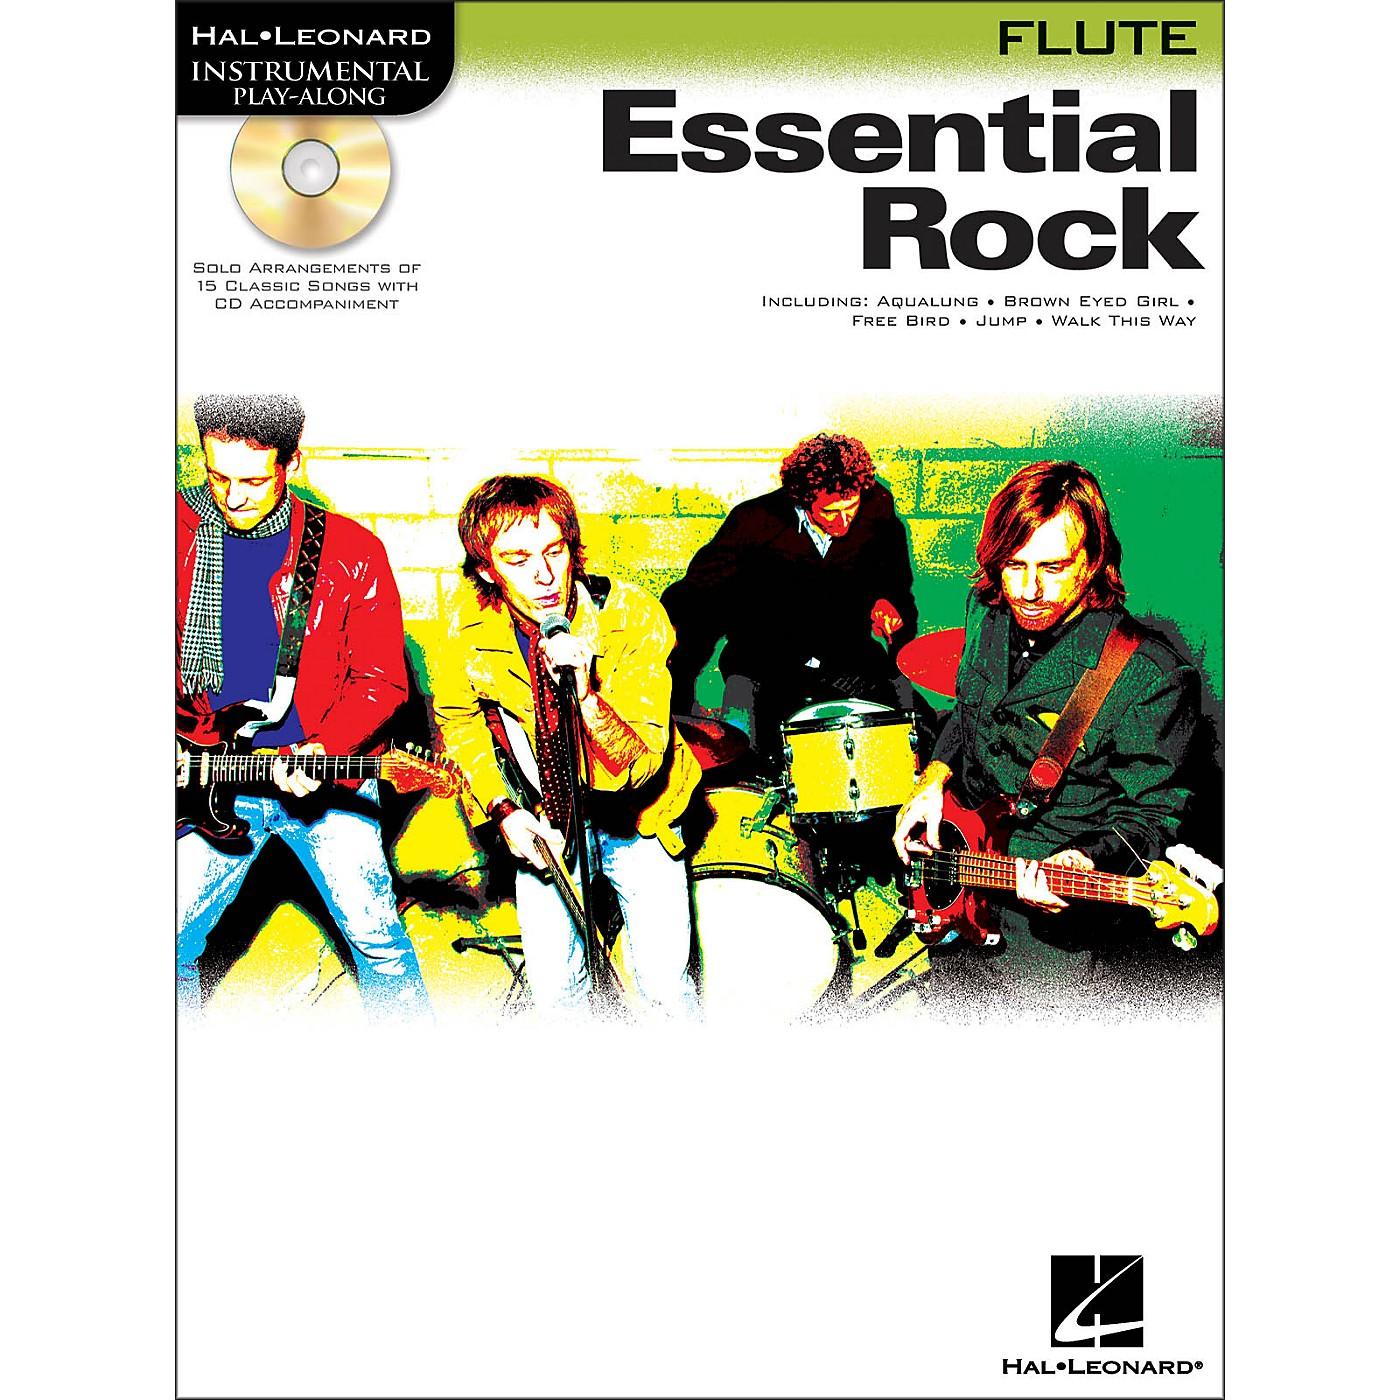 Hal Leonard Essential Rock for Flute Book/CD Instrumental Play-Along thumbnail